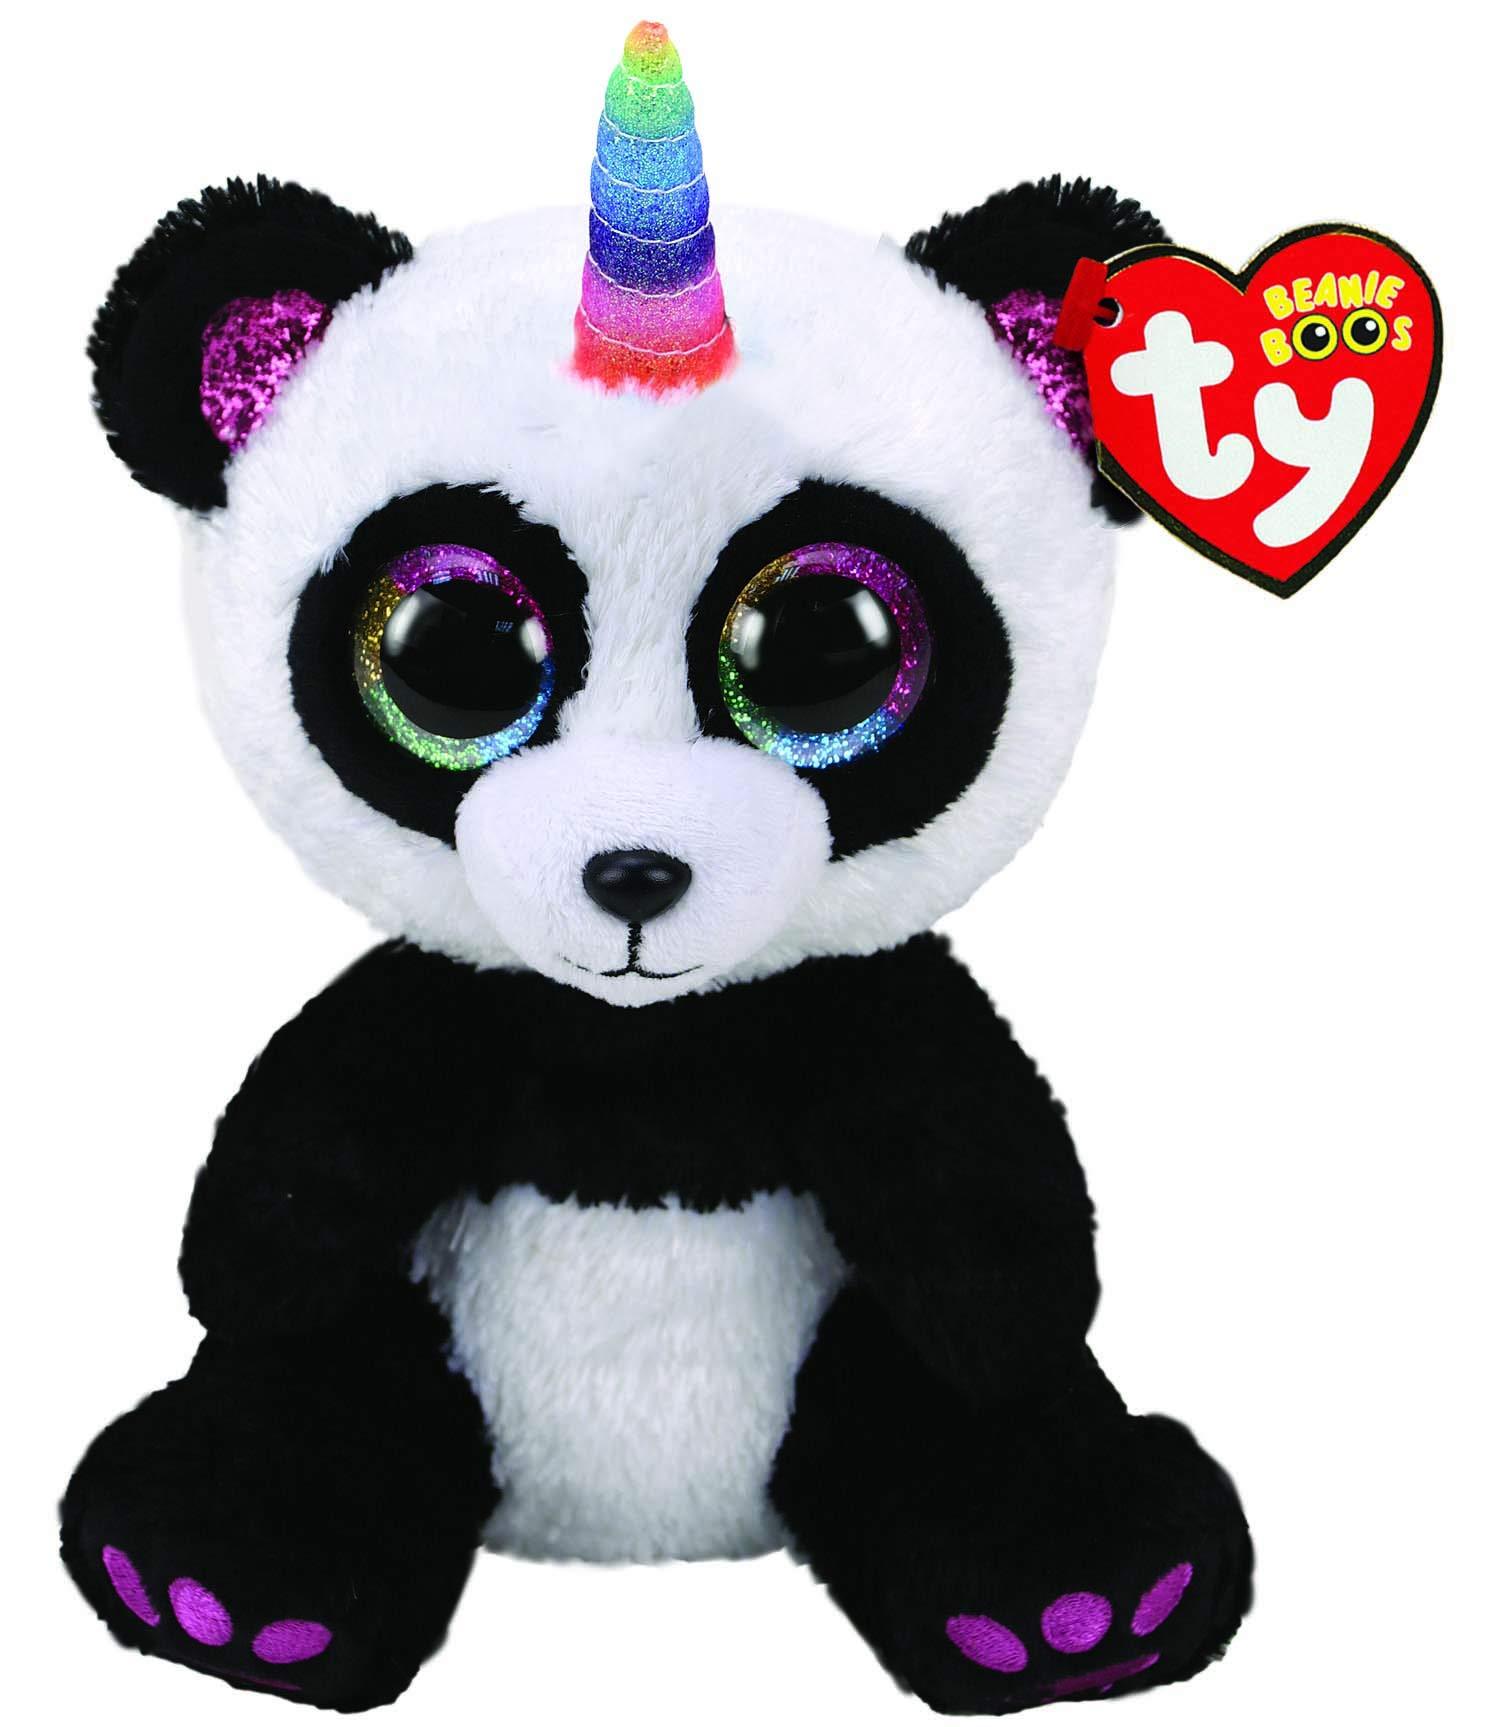 Ty UK Ltd 36307 Paris Panda W/Horn - Beanie Boos Plush Toy, Multicoloured, 15cm